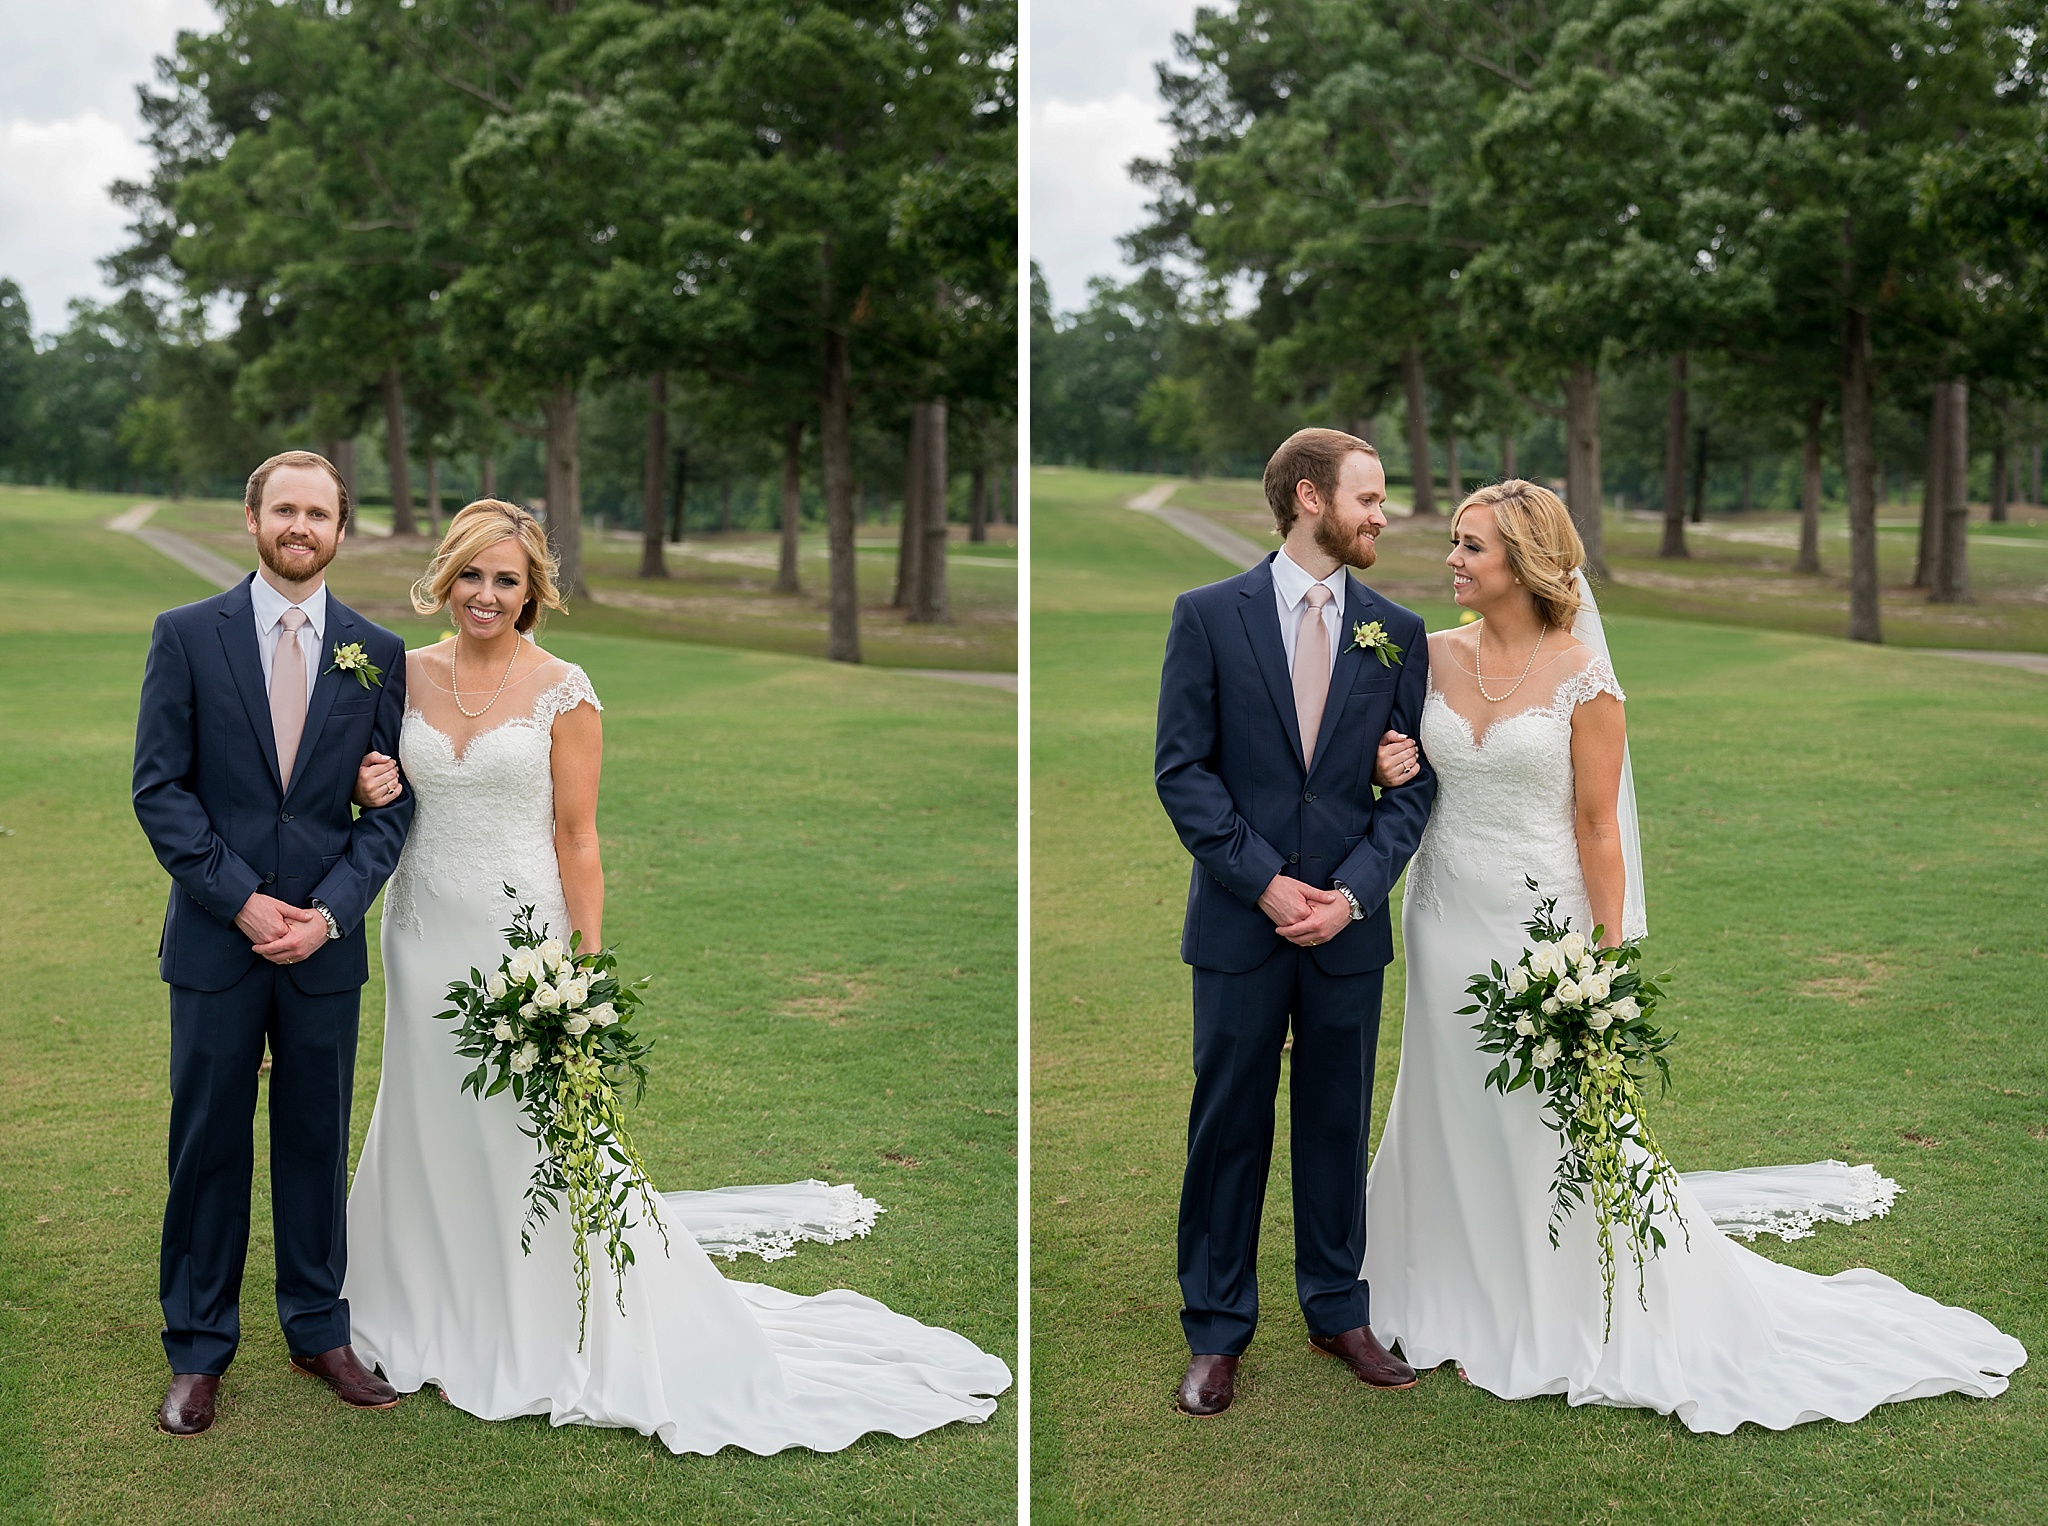 Williamston-NC-Wedding-Photographer-043.jpg